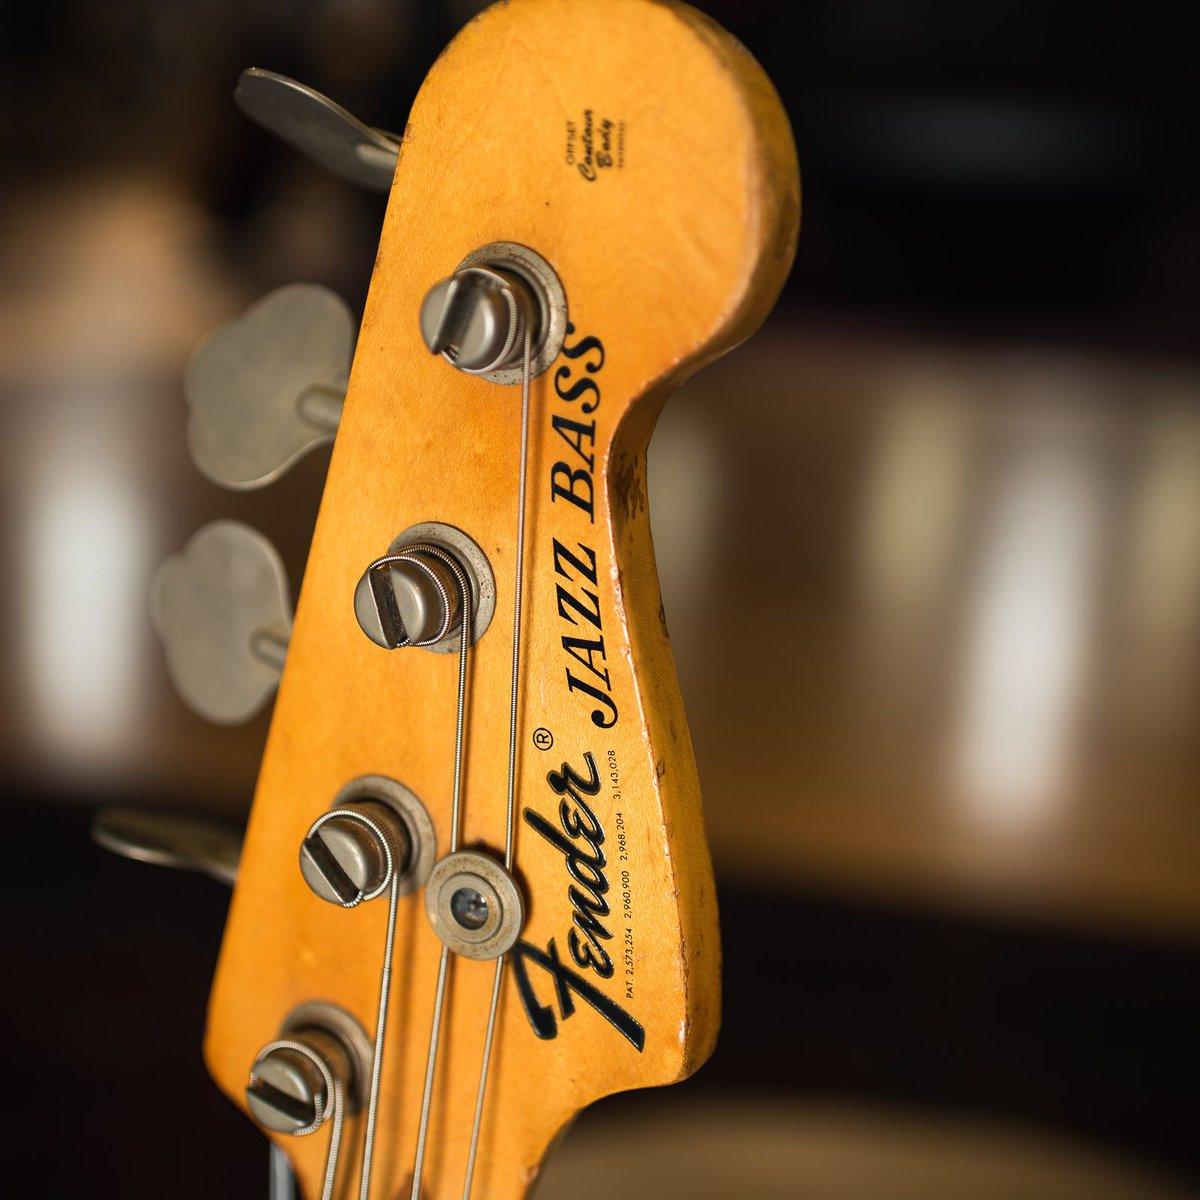 "George Gershwin said, ""Life is a lot like jazz… it's best when you improvise."" What's your dream @Fender Jazz Bass? https://buff.ly/2wUPfcG #chicagomusicexchange #thebassment #fender #jazzbass #dream #georgegershwin #basstalk #bassplayer #tonemob #knowyourtone #gearwirepic.twitter.com/7qfBfcIzi5"